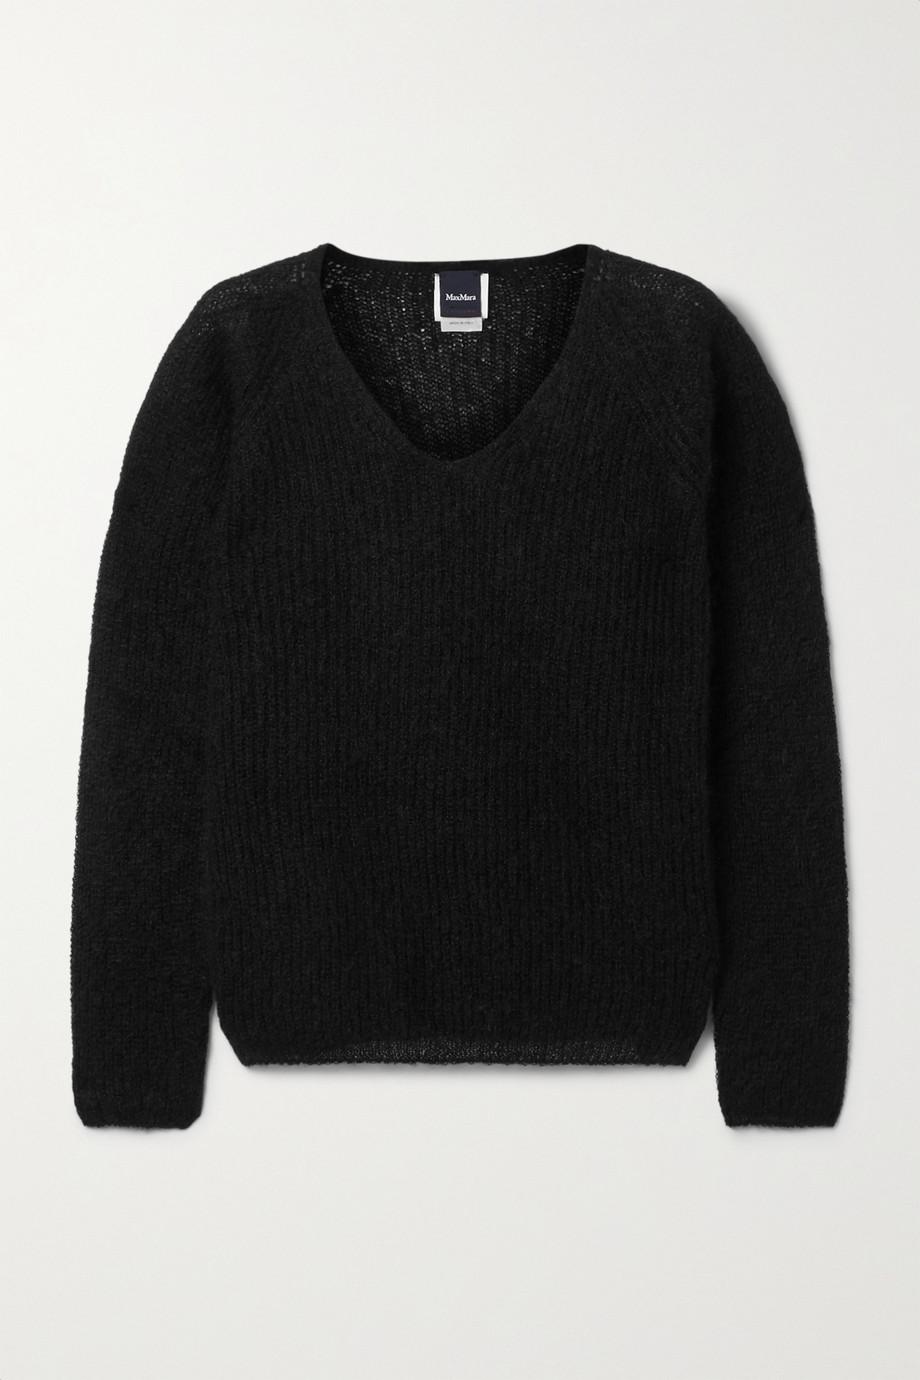 Max Mara Leisure ribbed mohair-blend sweater